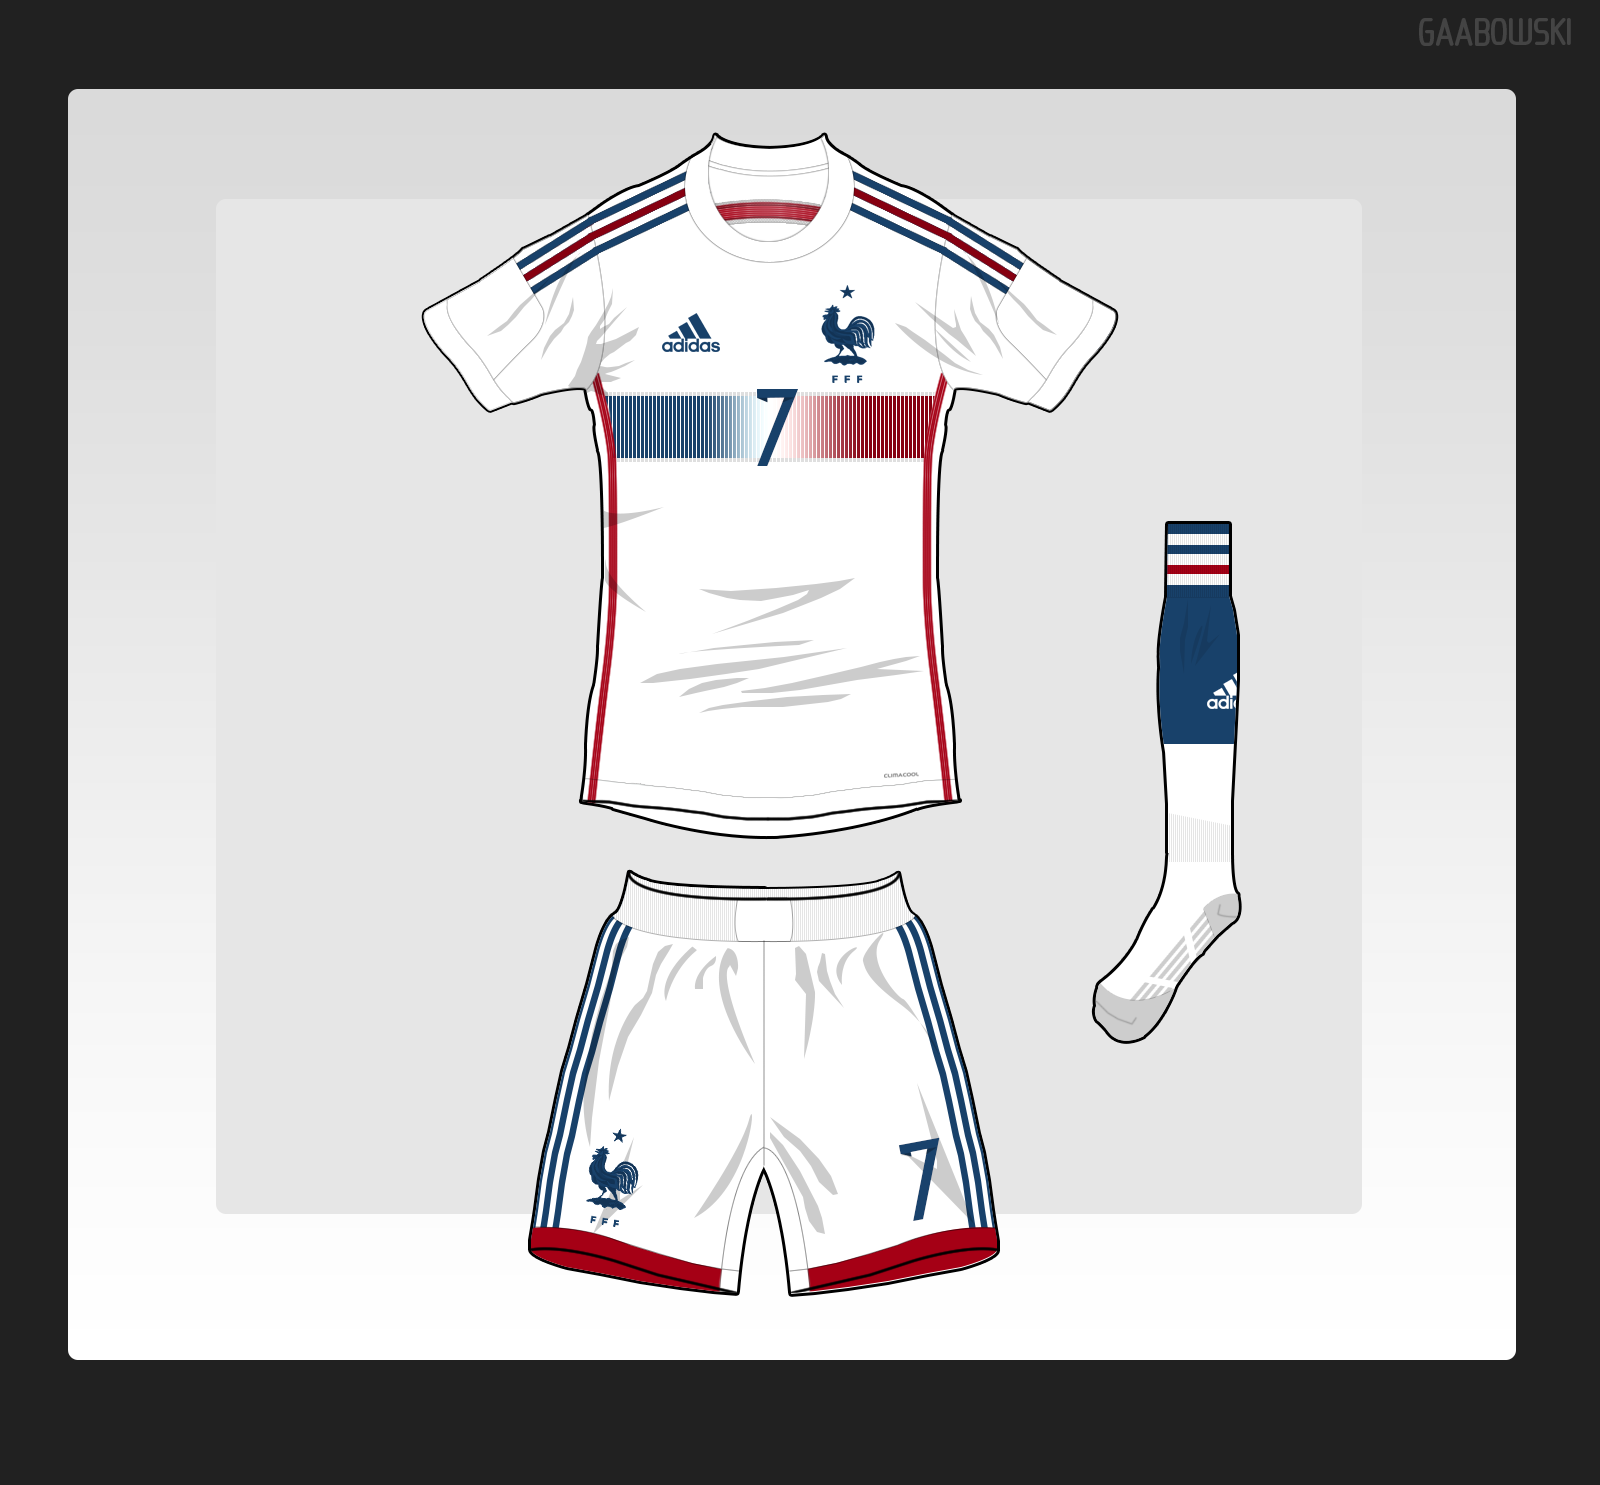 brand new 6571f fa194 France 2014 Away Kit Adidas